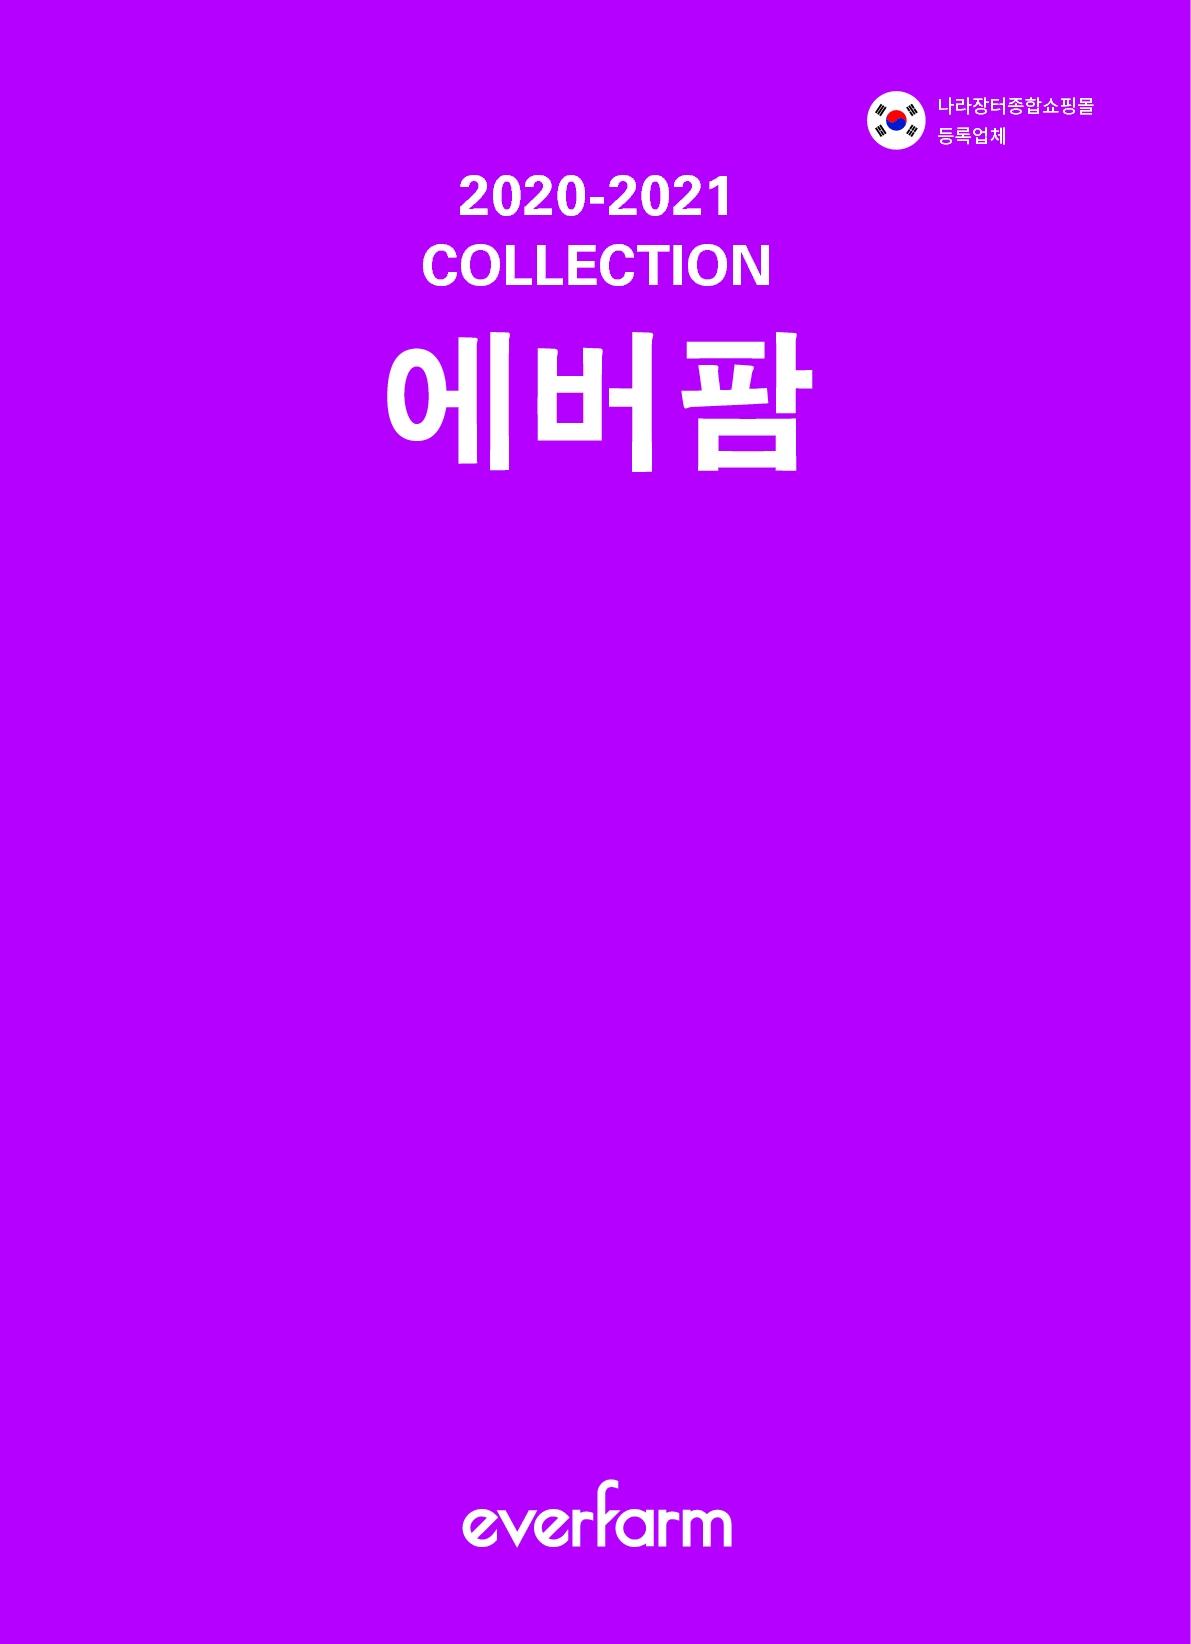 2020ef-collection.pdf_1